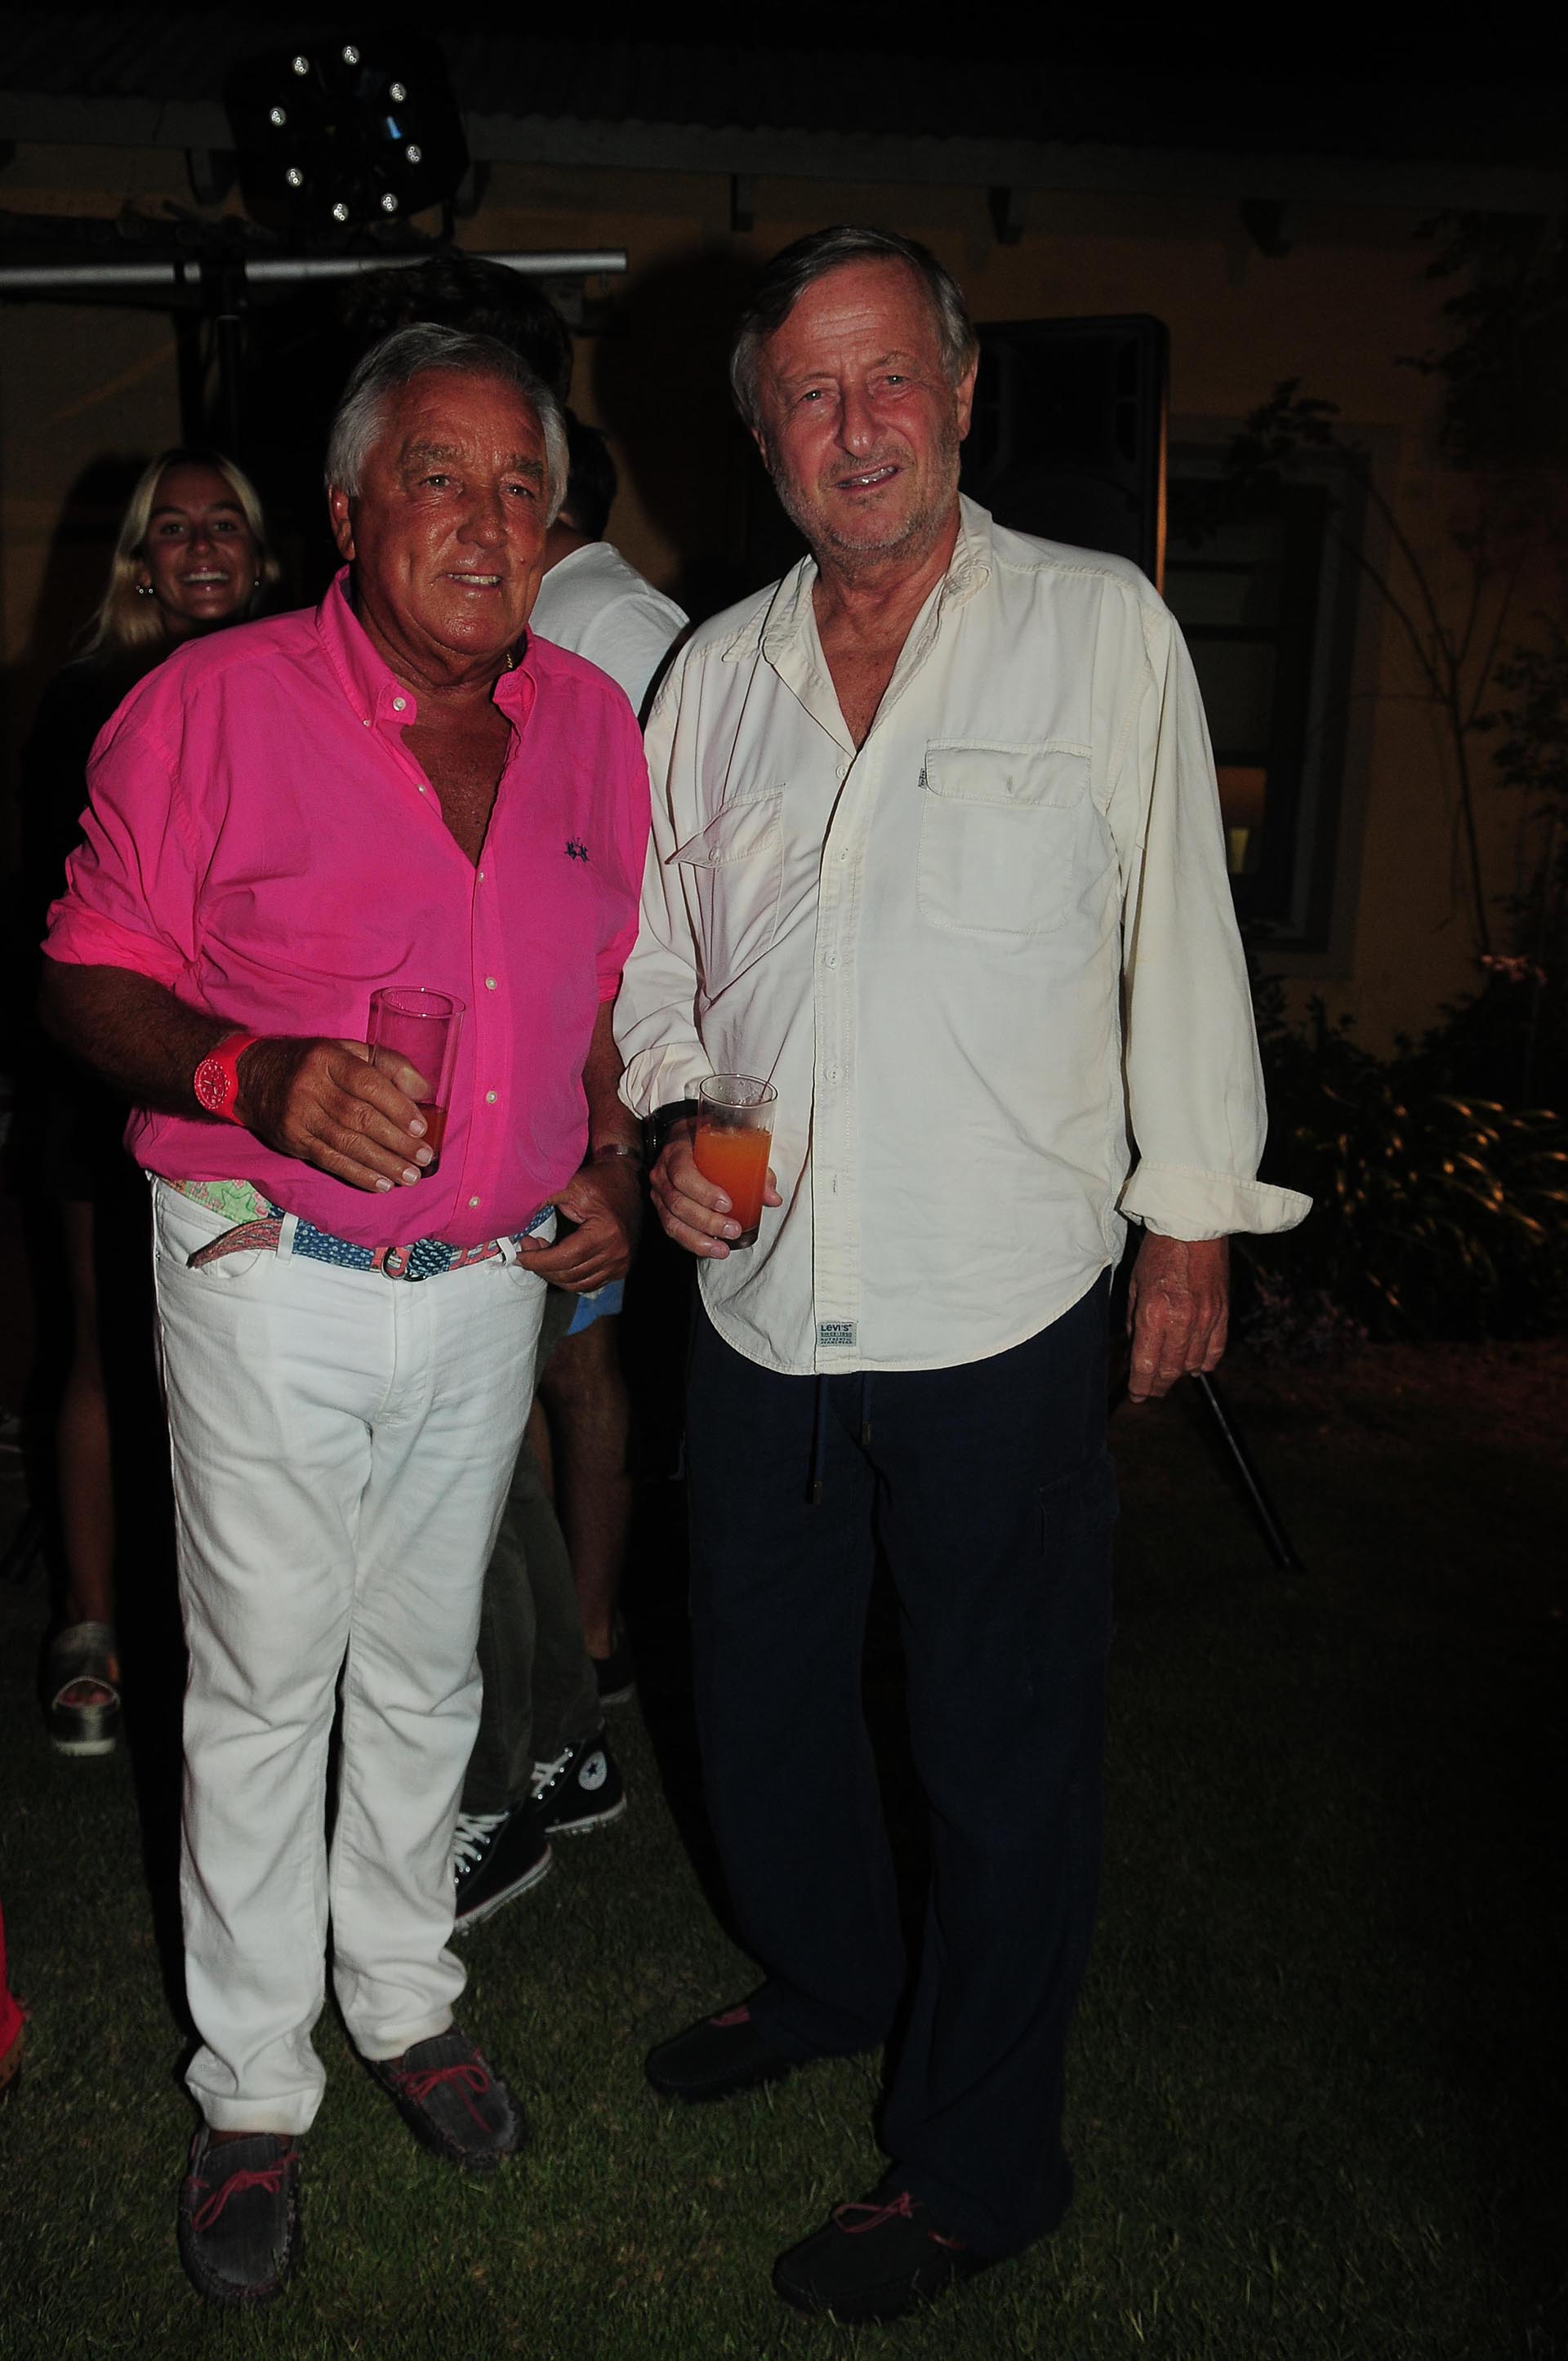 Julio De Marco y Cristiano Rattazzi